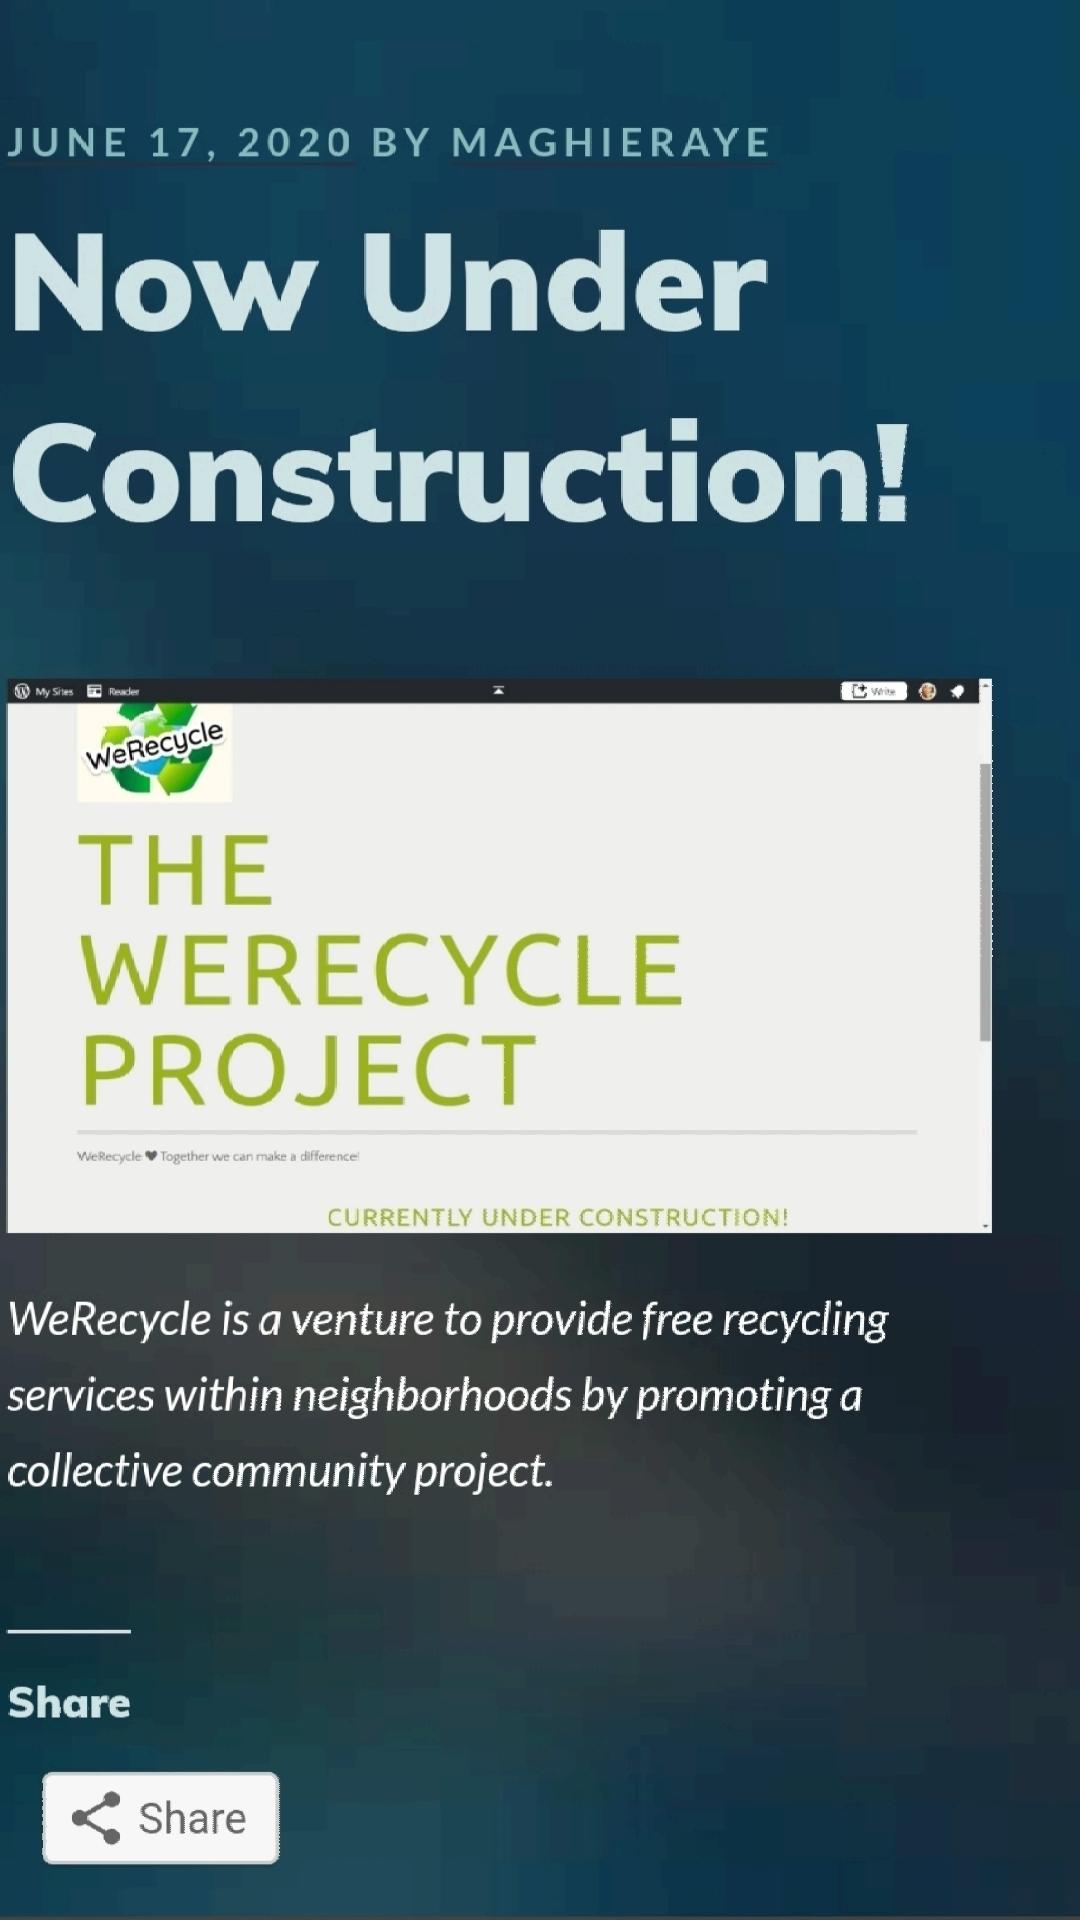 Werecycle under construction image